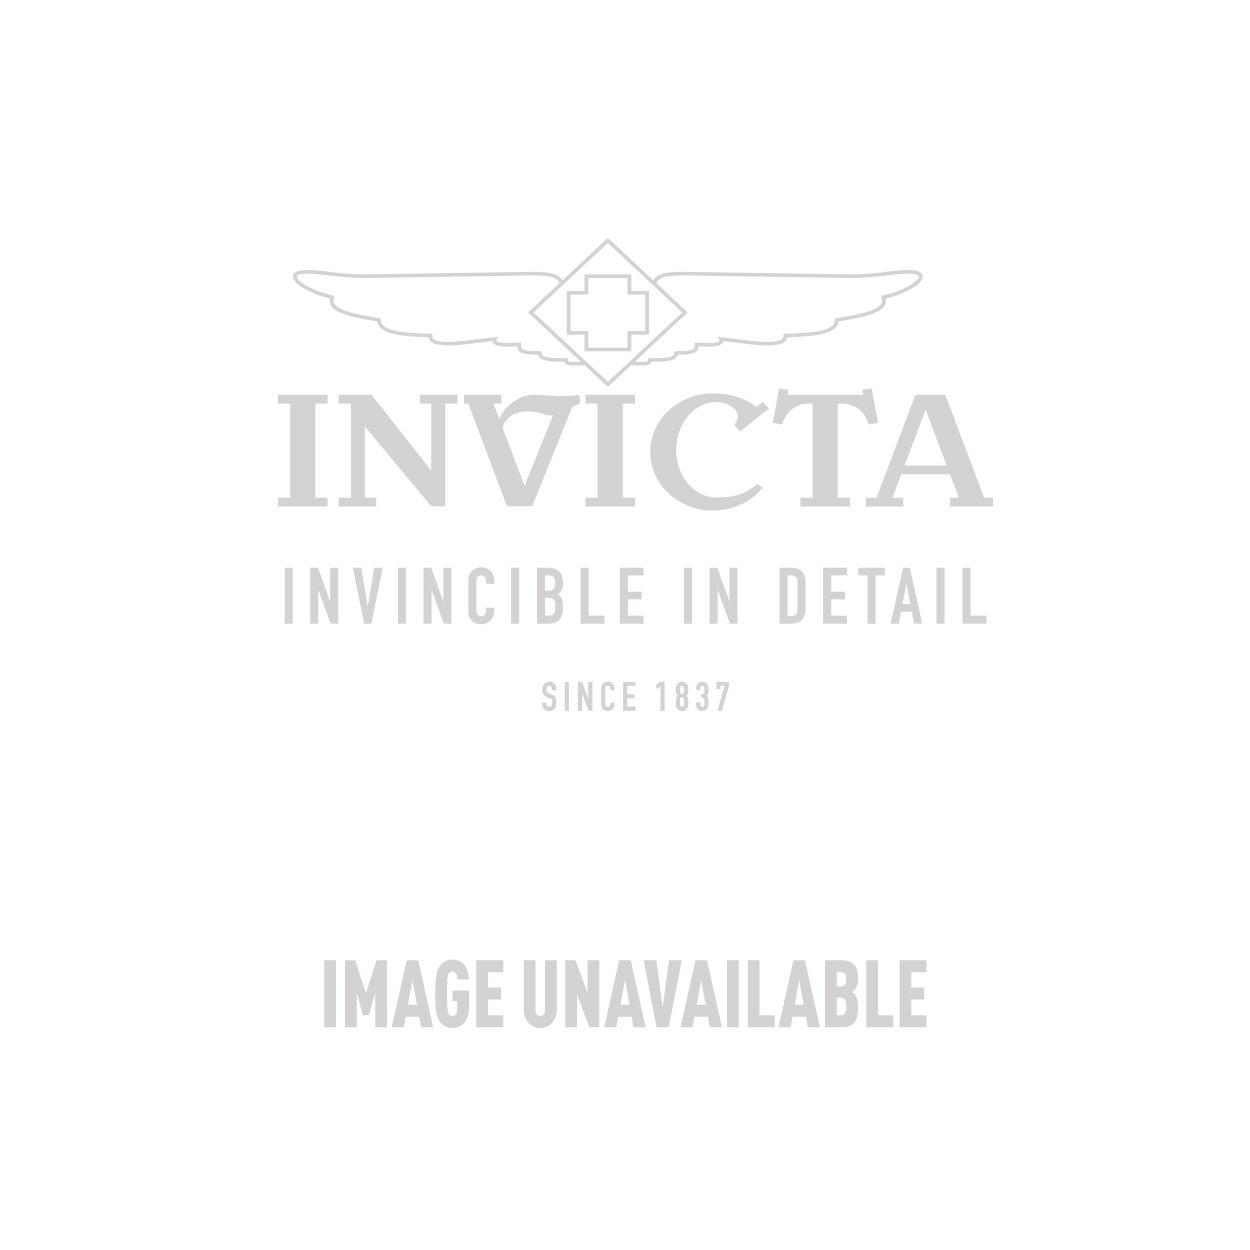 Invicta Speedway Swiss Movement Quartz Watch - Gunmetal case with Gunmetal tone Stainless Steel band - Model 19854